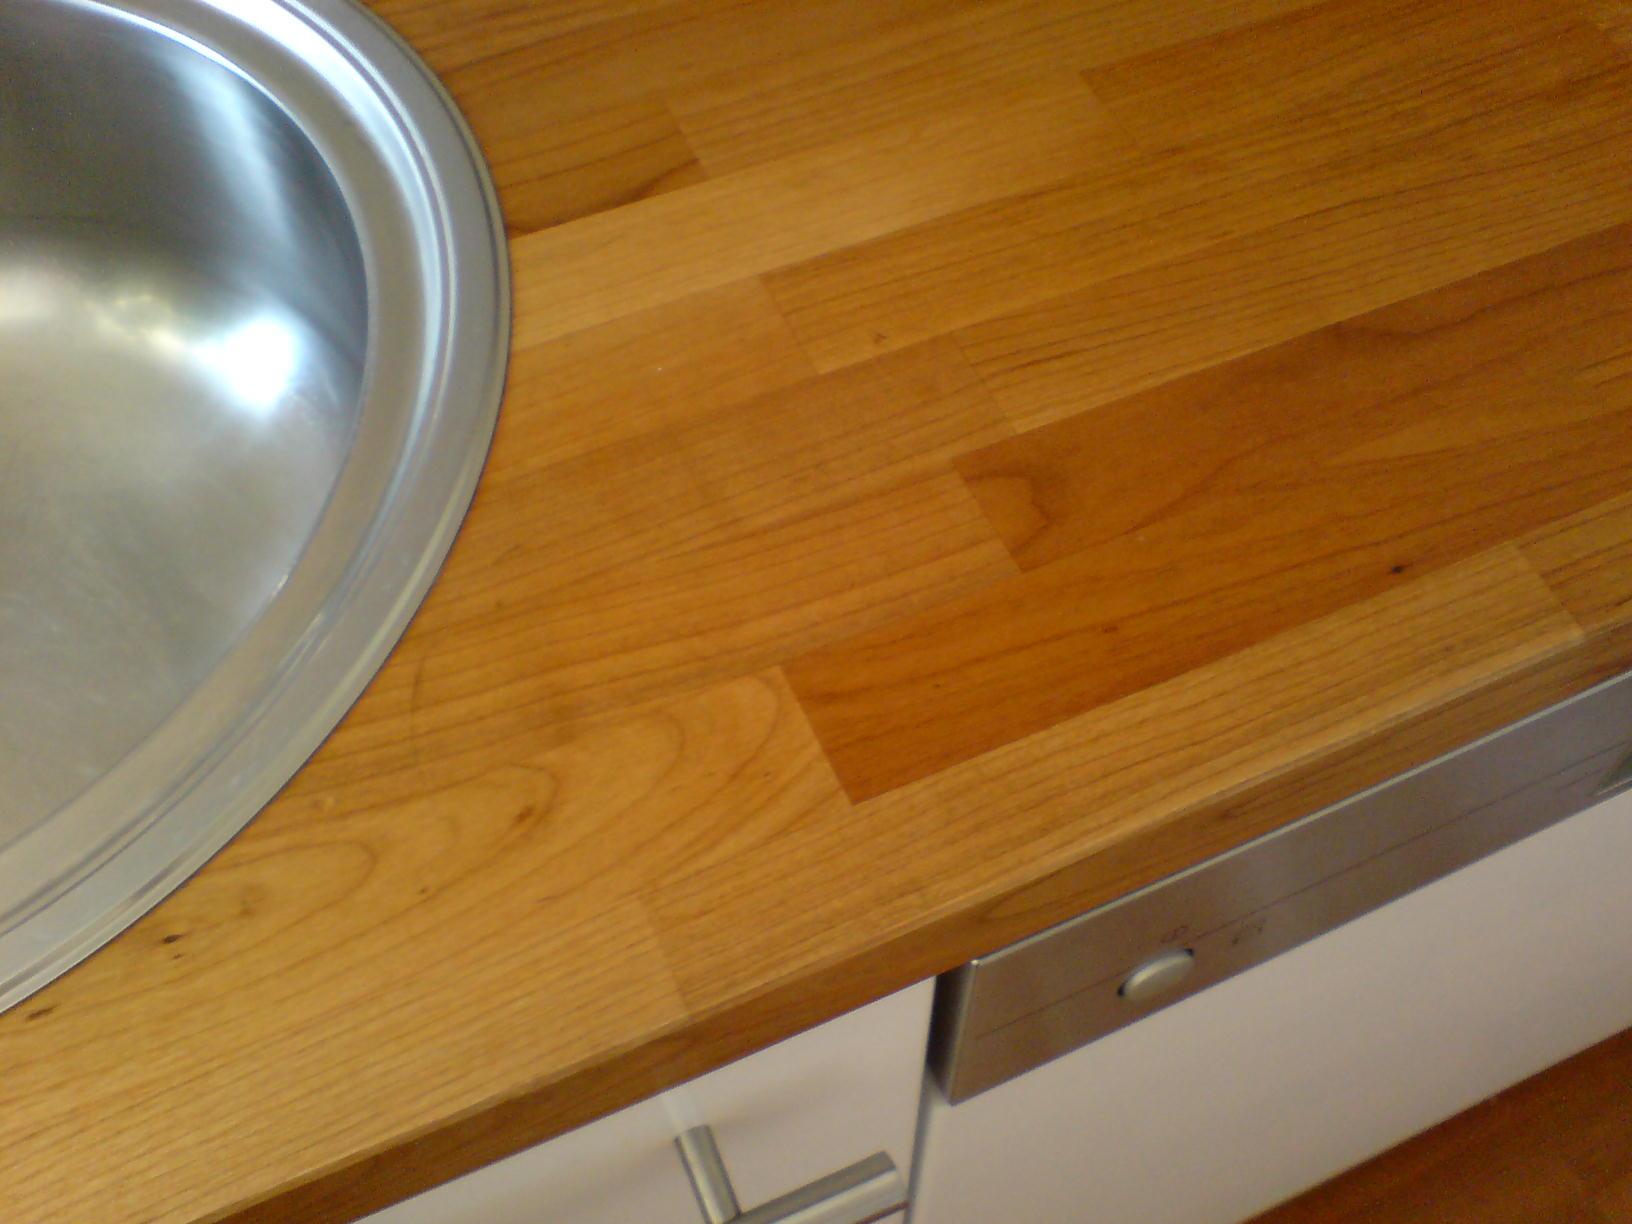 Best Küchenarbeitsplatten Online Bestellen Images - Milbank.us ...